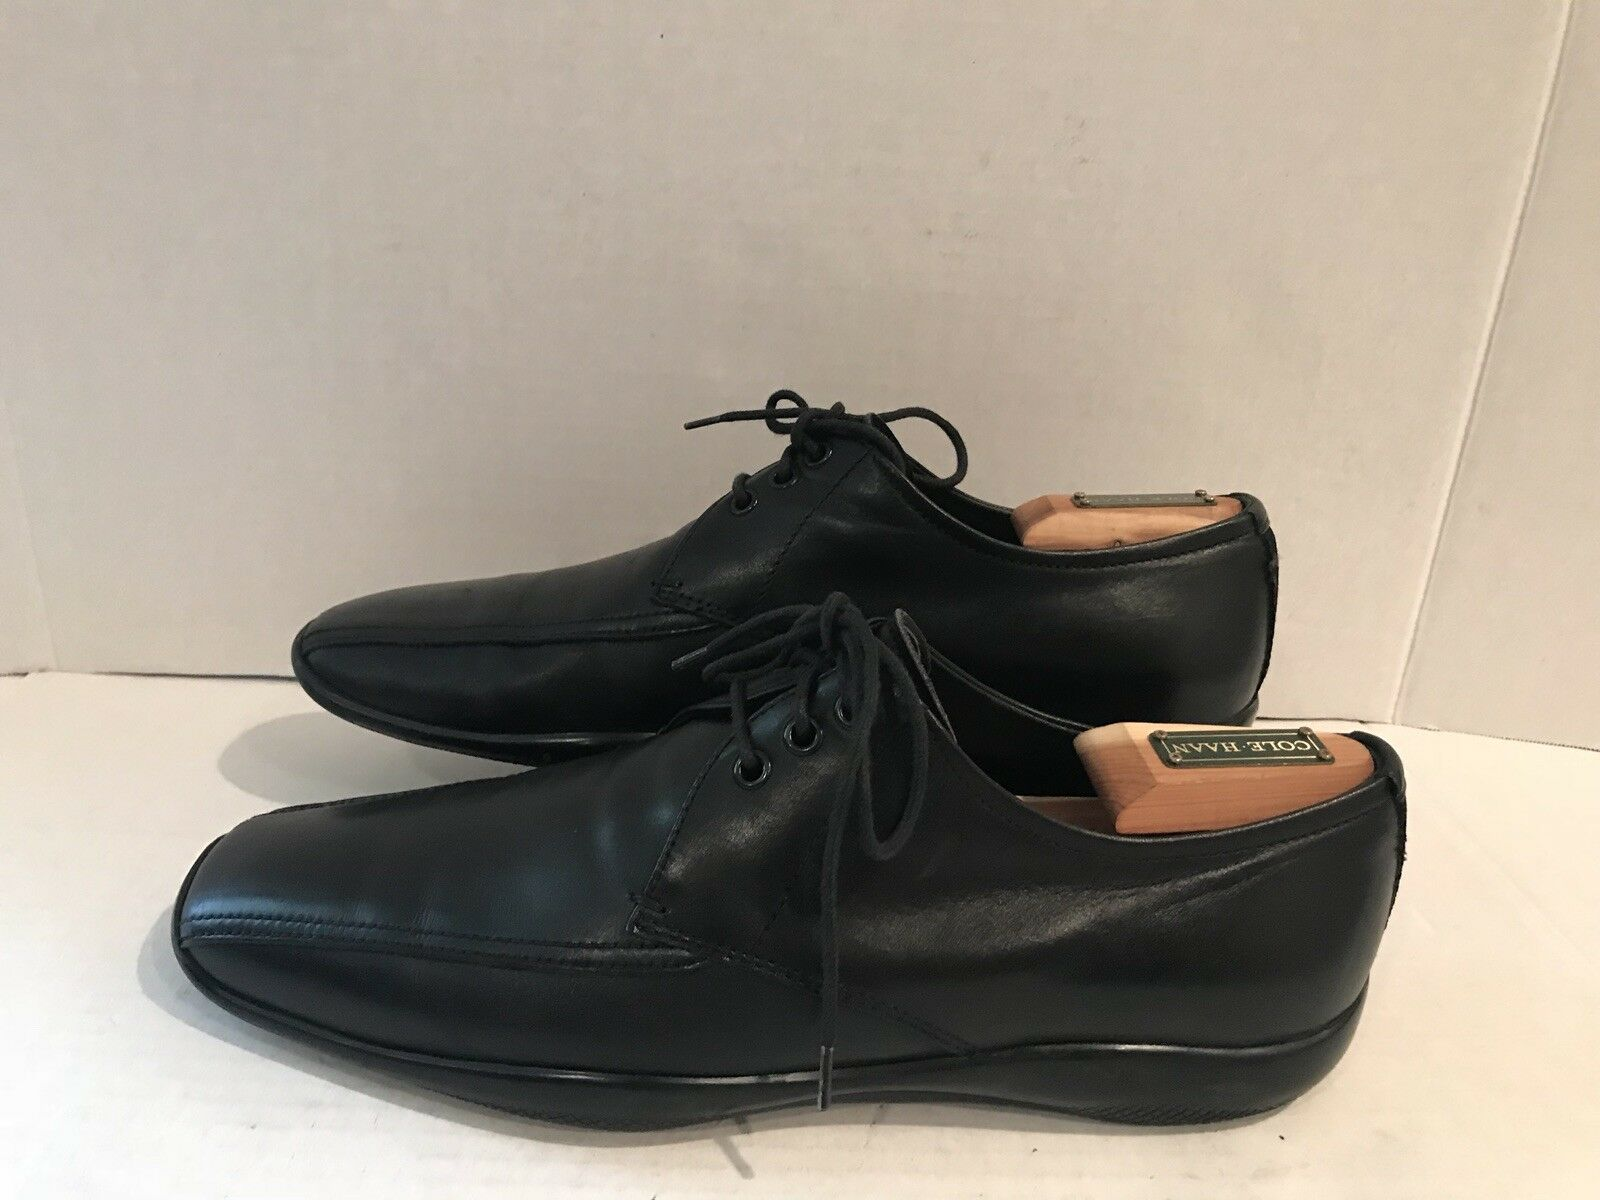 Prada shoes Prada Sport Men Classic Lace Up Black Leather shoes SZ 7.5 UK 8.5 US